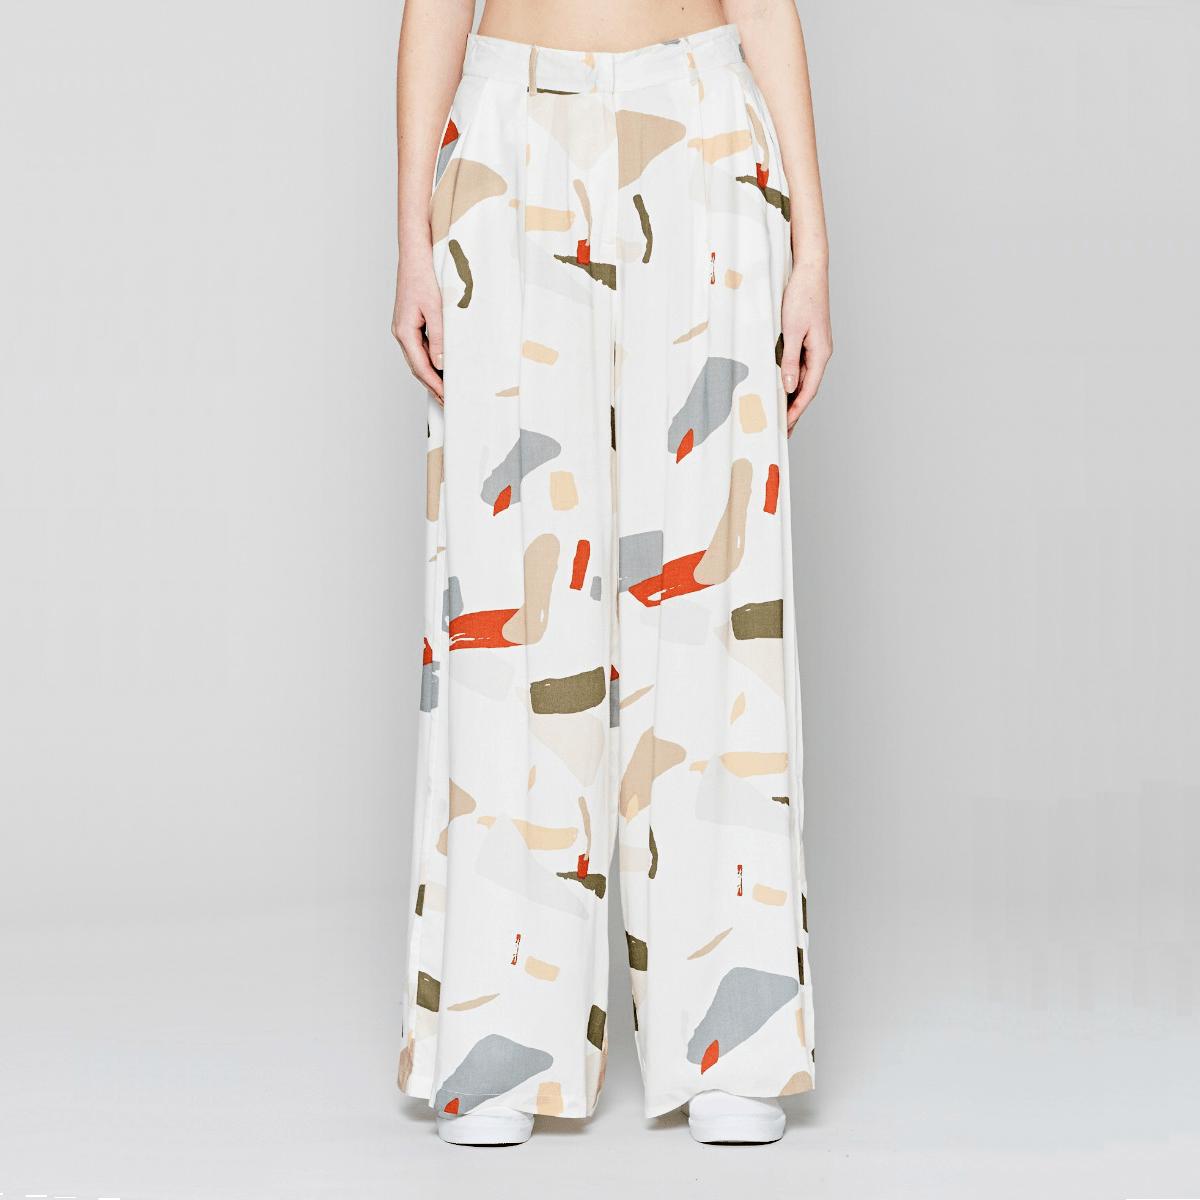 Bílé kalhoty - Organic Displacement - XS